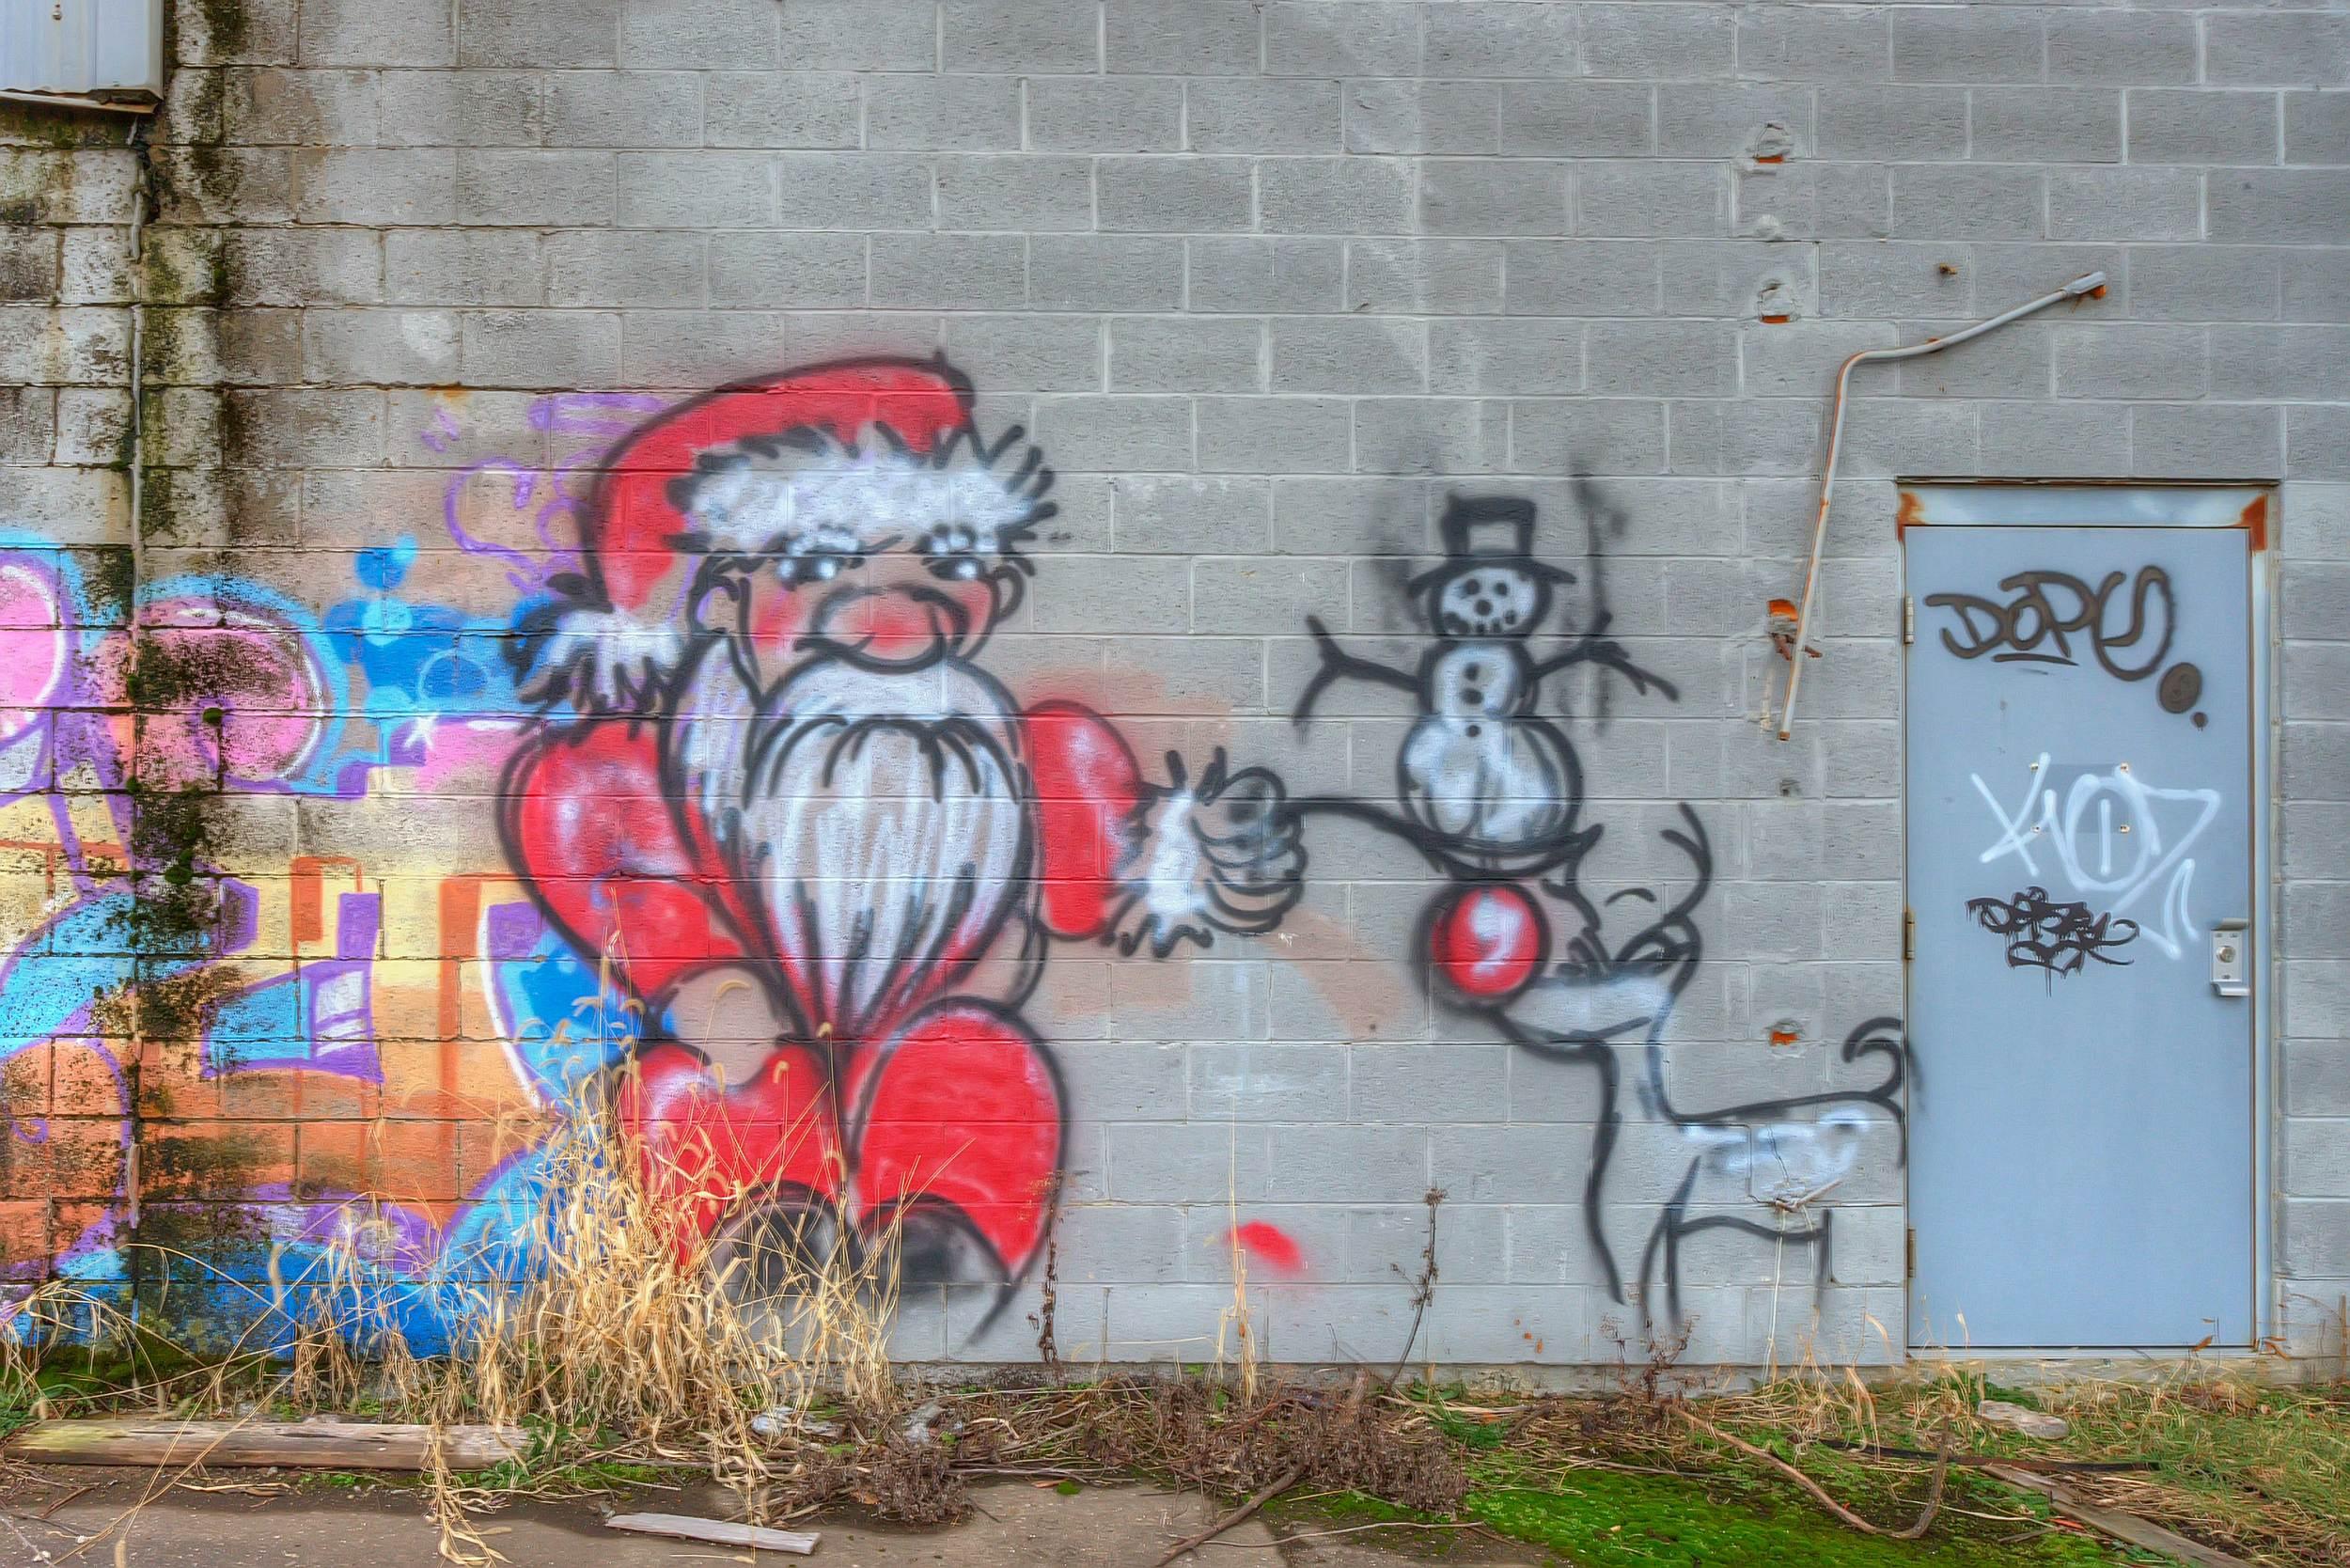 Santa, Reindeer, & Snowman Graffiti on abandoned factory building